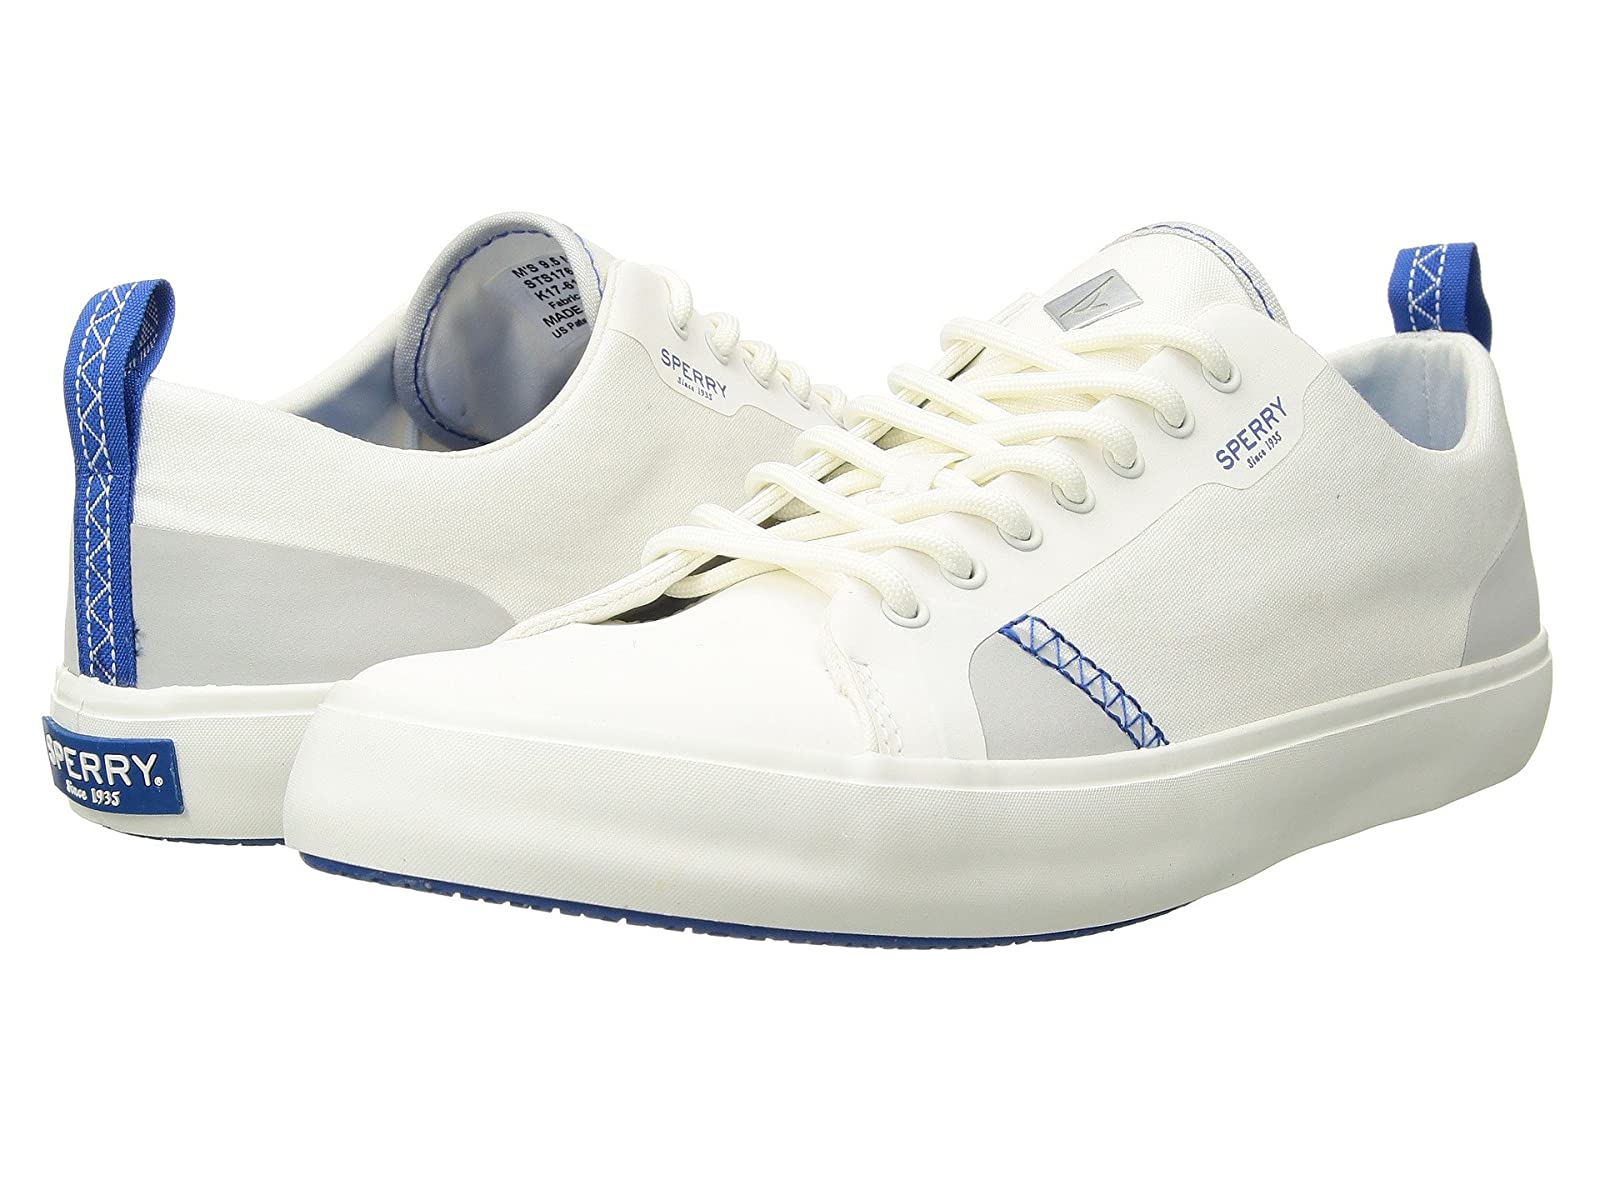 Sperry Flex Deck LTT CanvasAtmospheric grades have affordable shoes